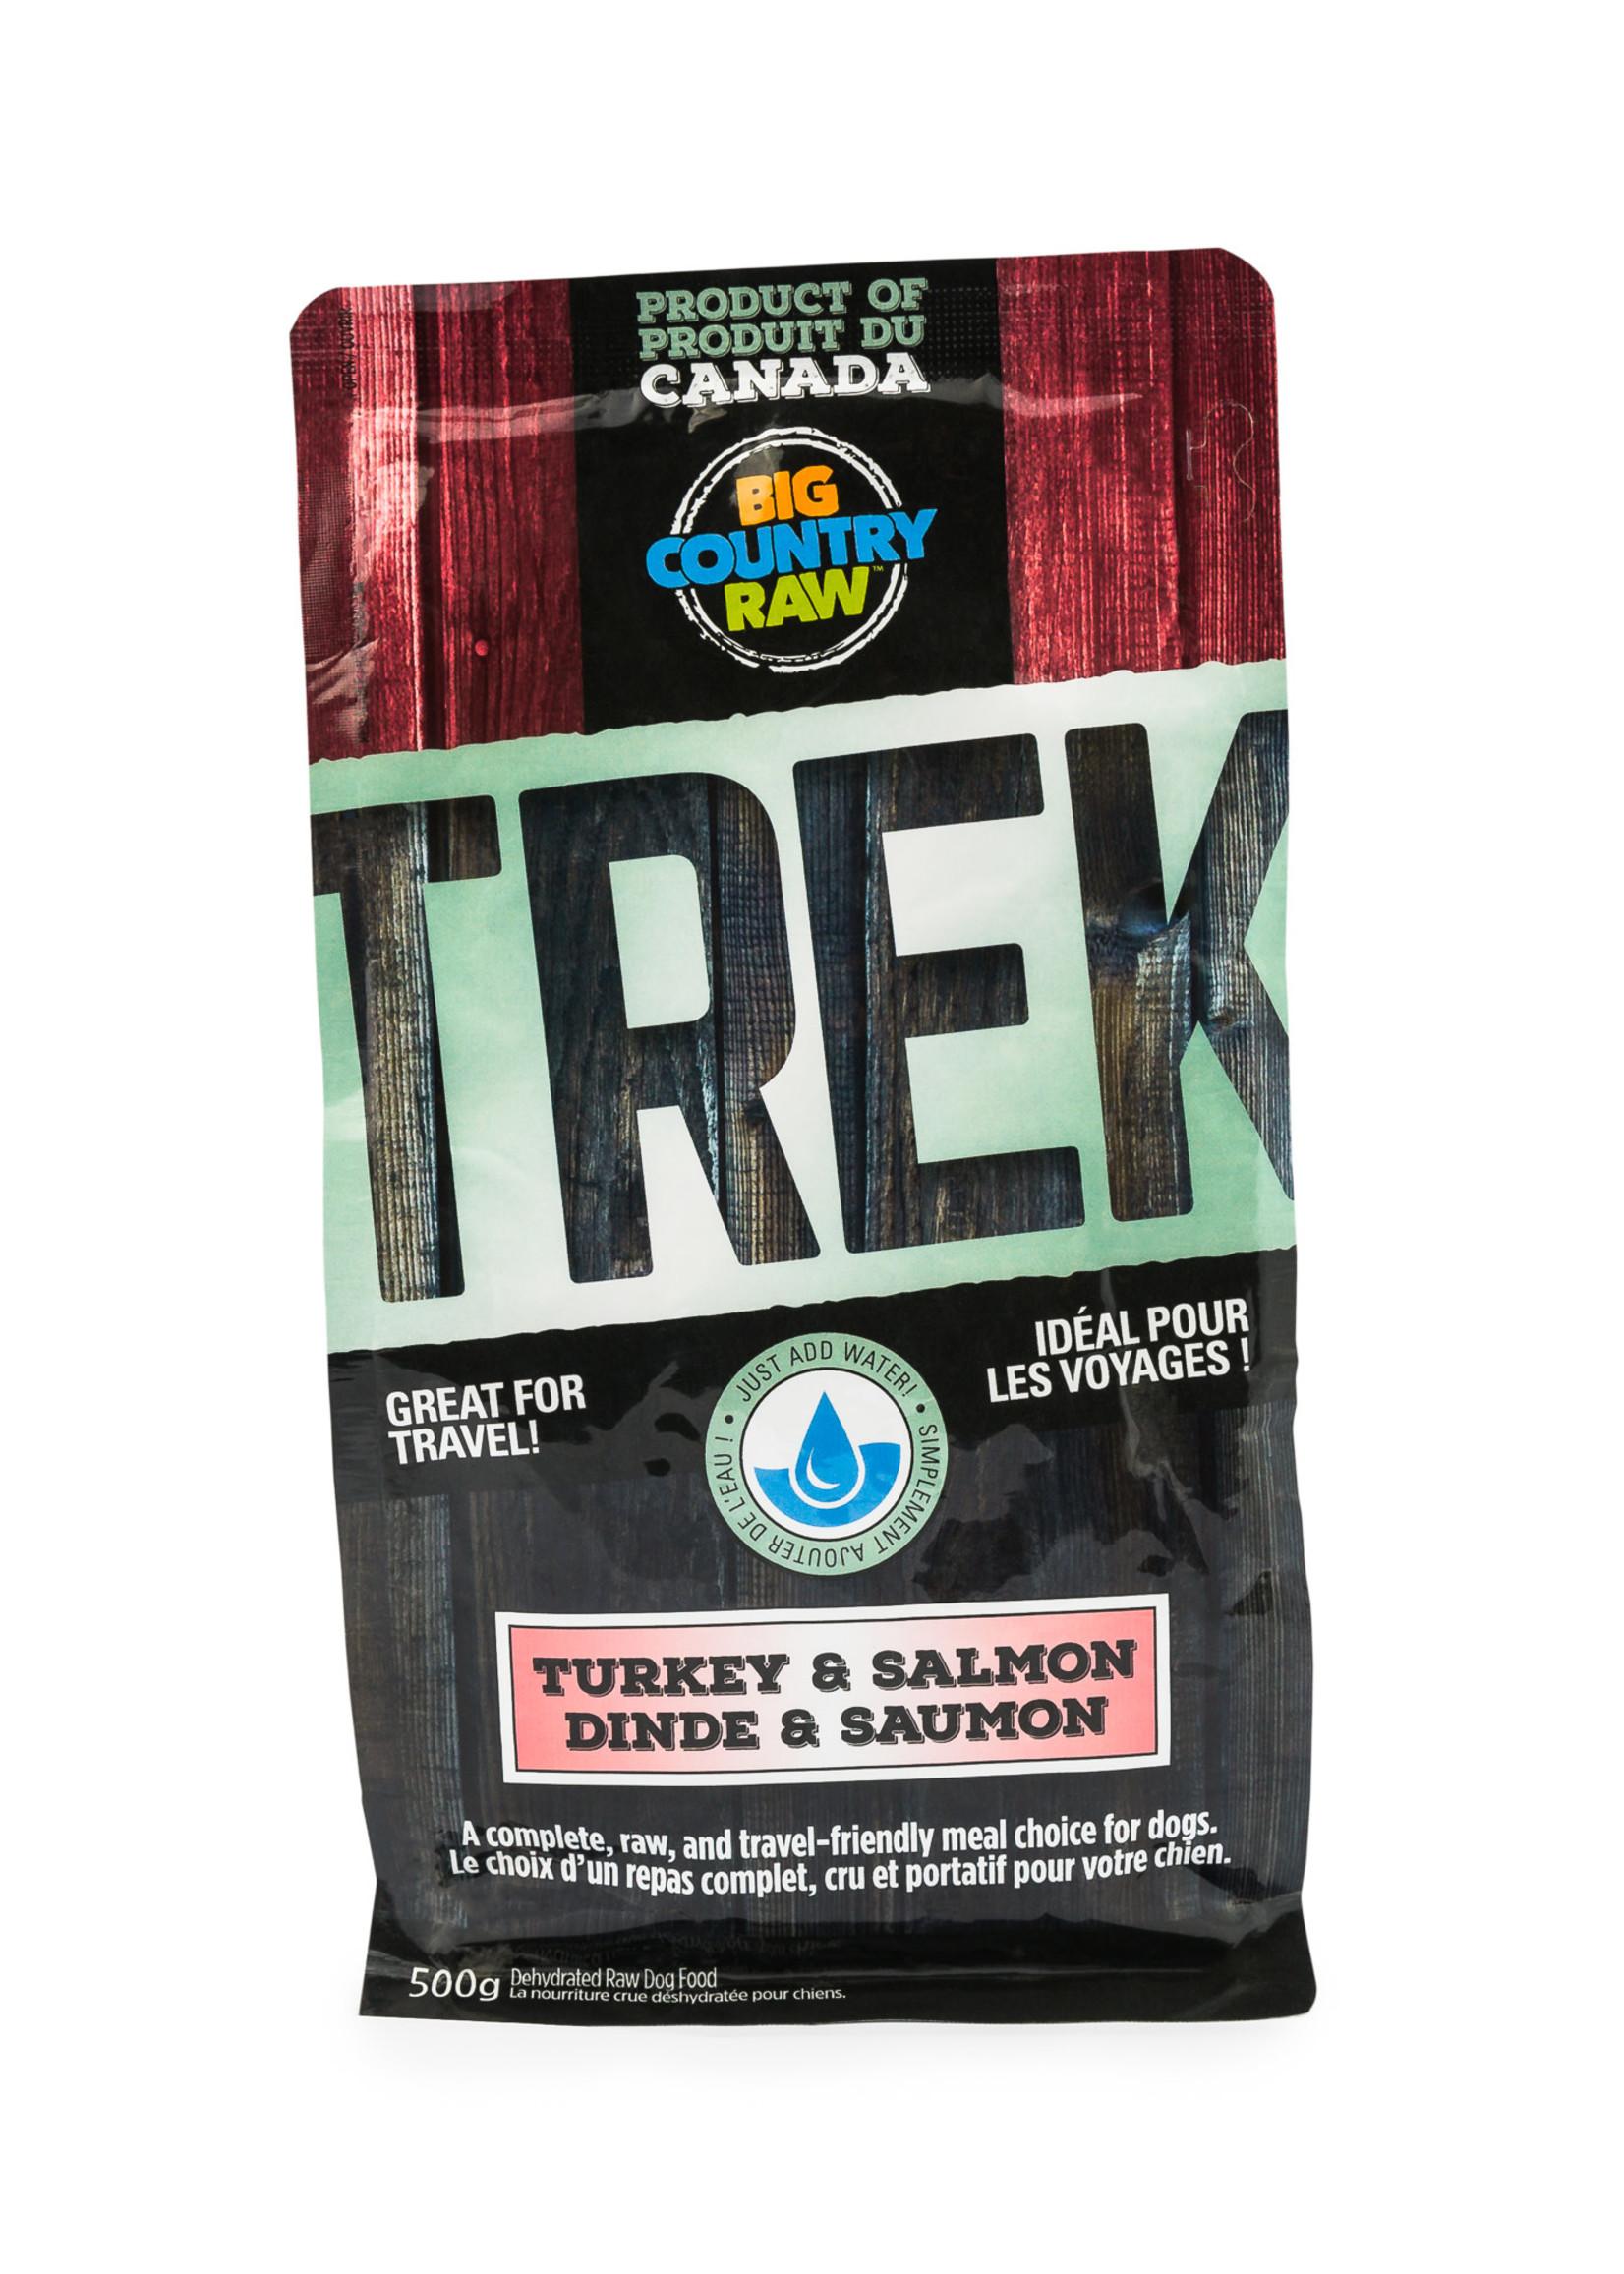 Trek Trek Turkey and Salmon 500g